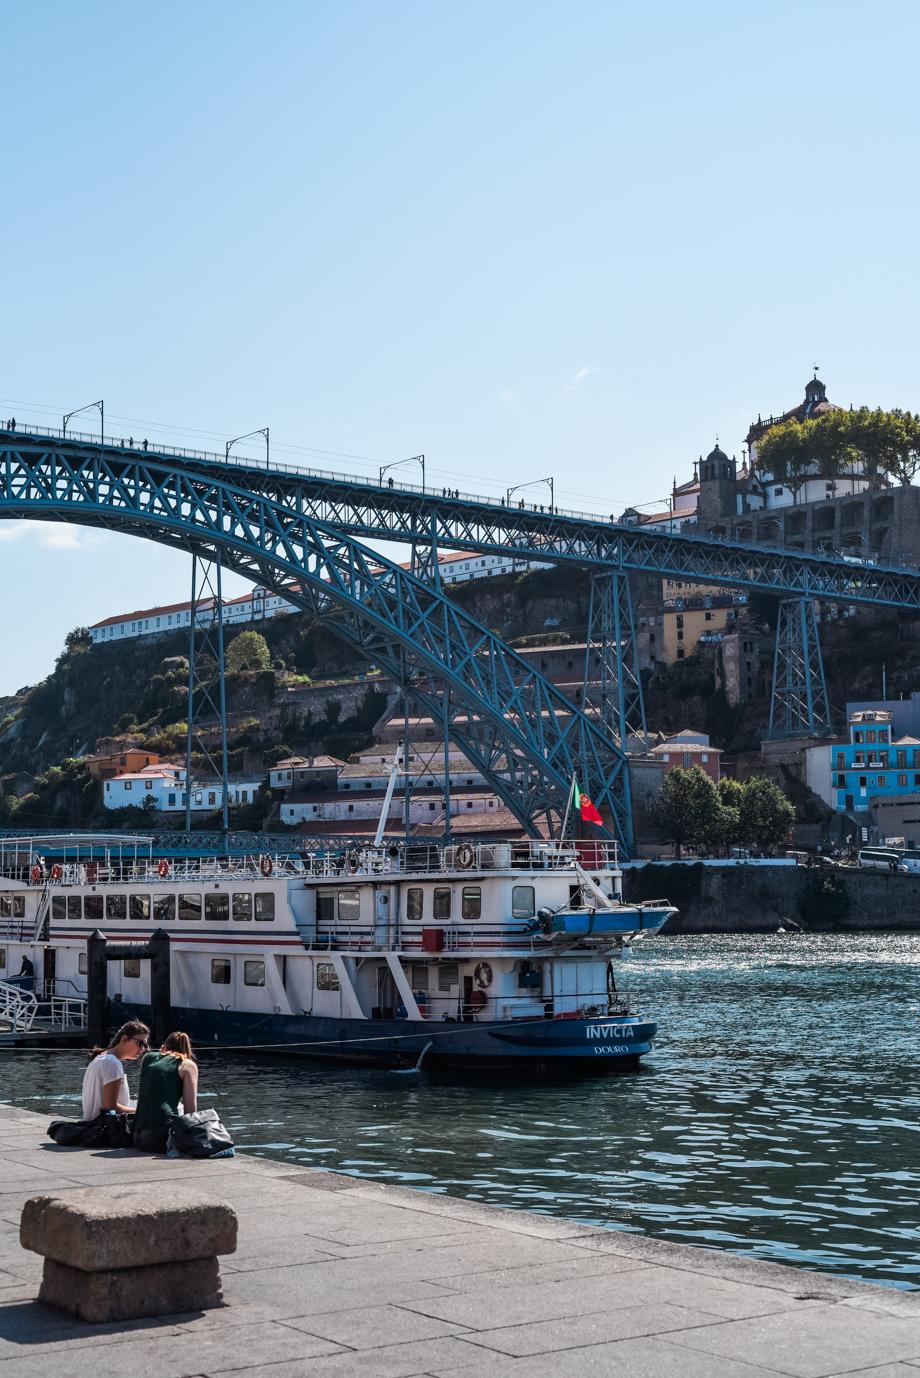 WebQuality-Porto-10yearsVentigrate-AnaisStoelenPhotography-138.jpg